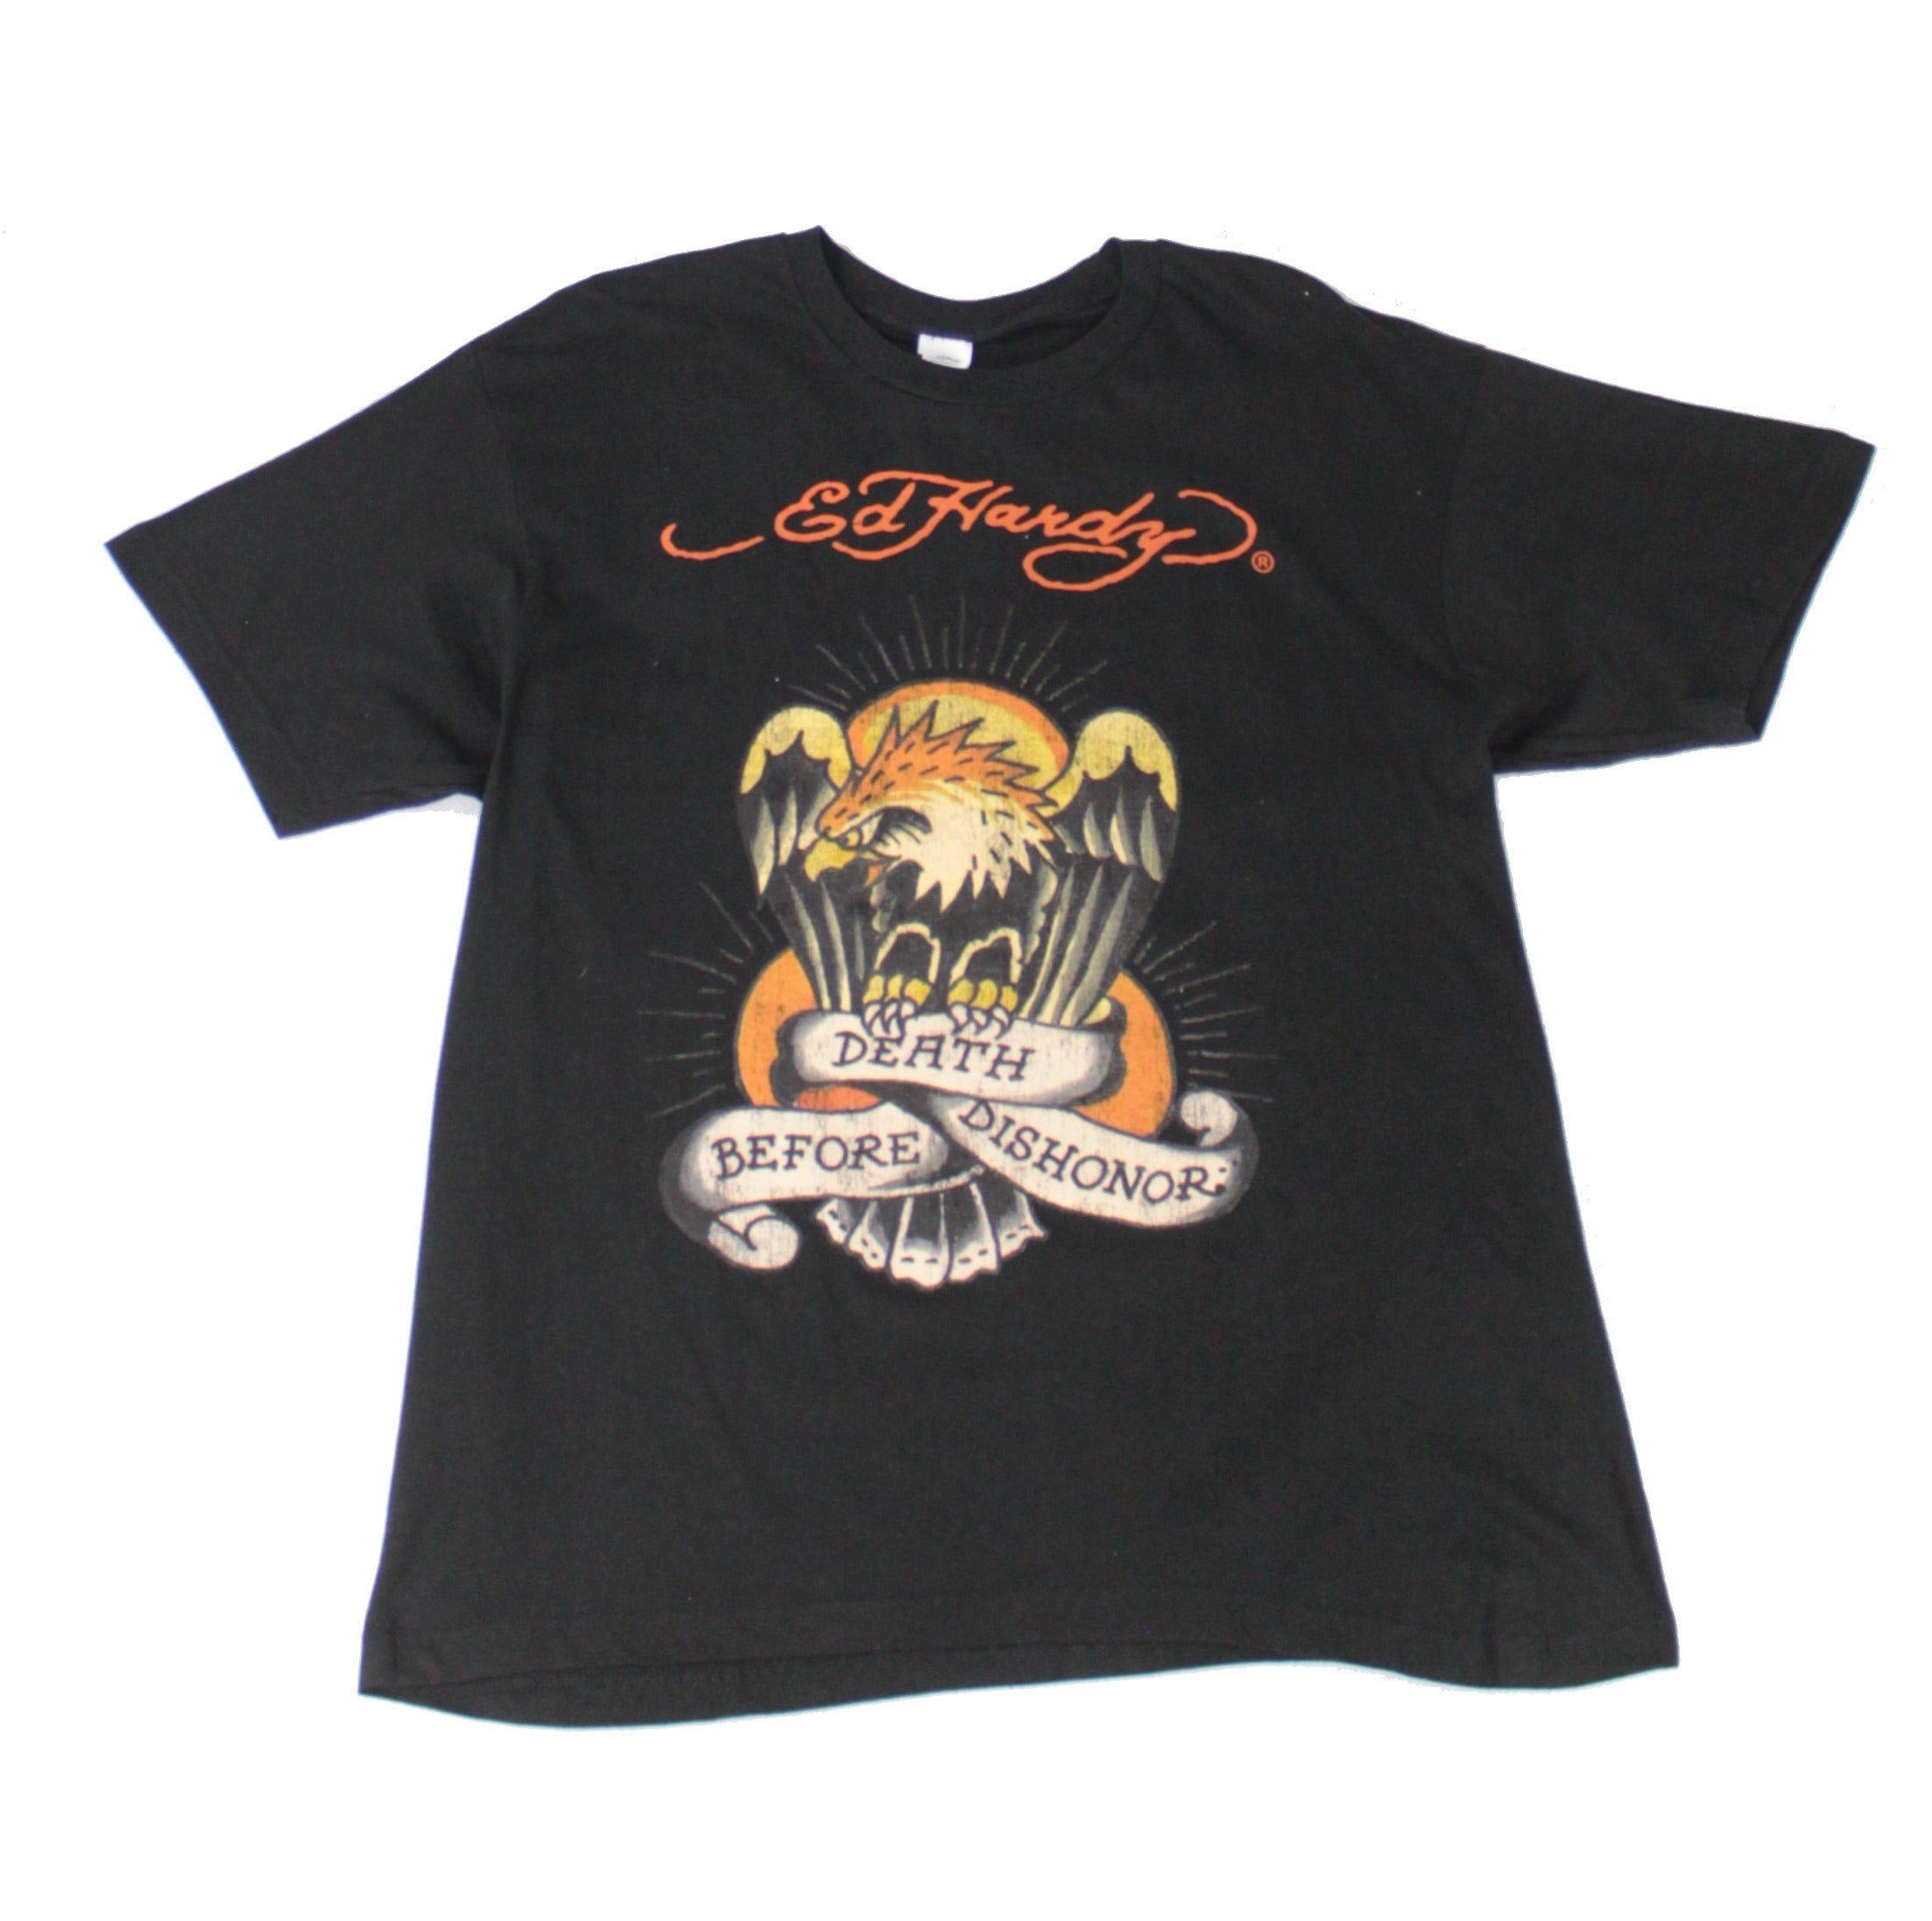 Ed Hardy Mens T-Shirt Black Size Large L Beath Before Dishonor Graphic